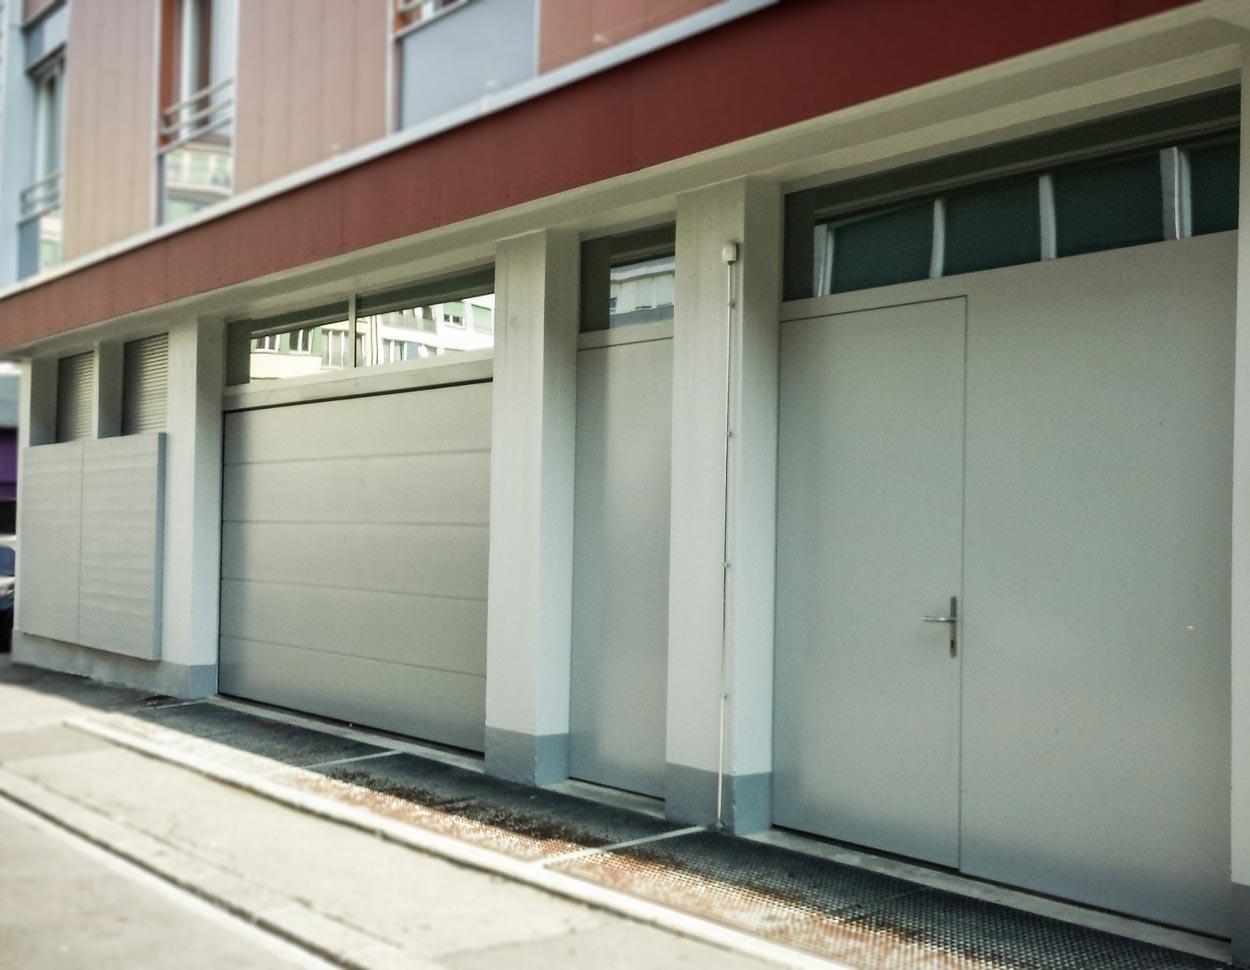 portail et porte baciu constructions m talliques verre aluminium fer. Black Bedroom Furniture Sets. Home Design Ideas